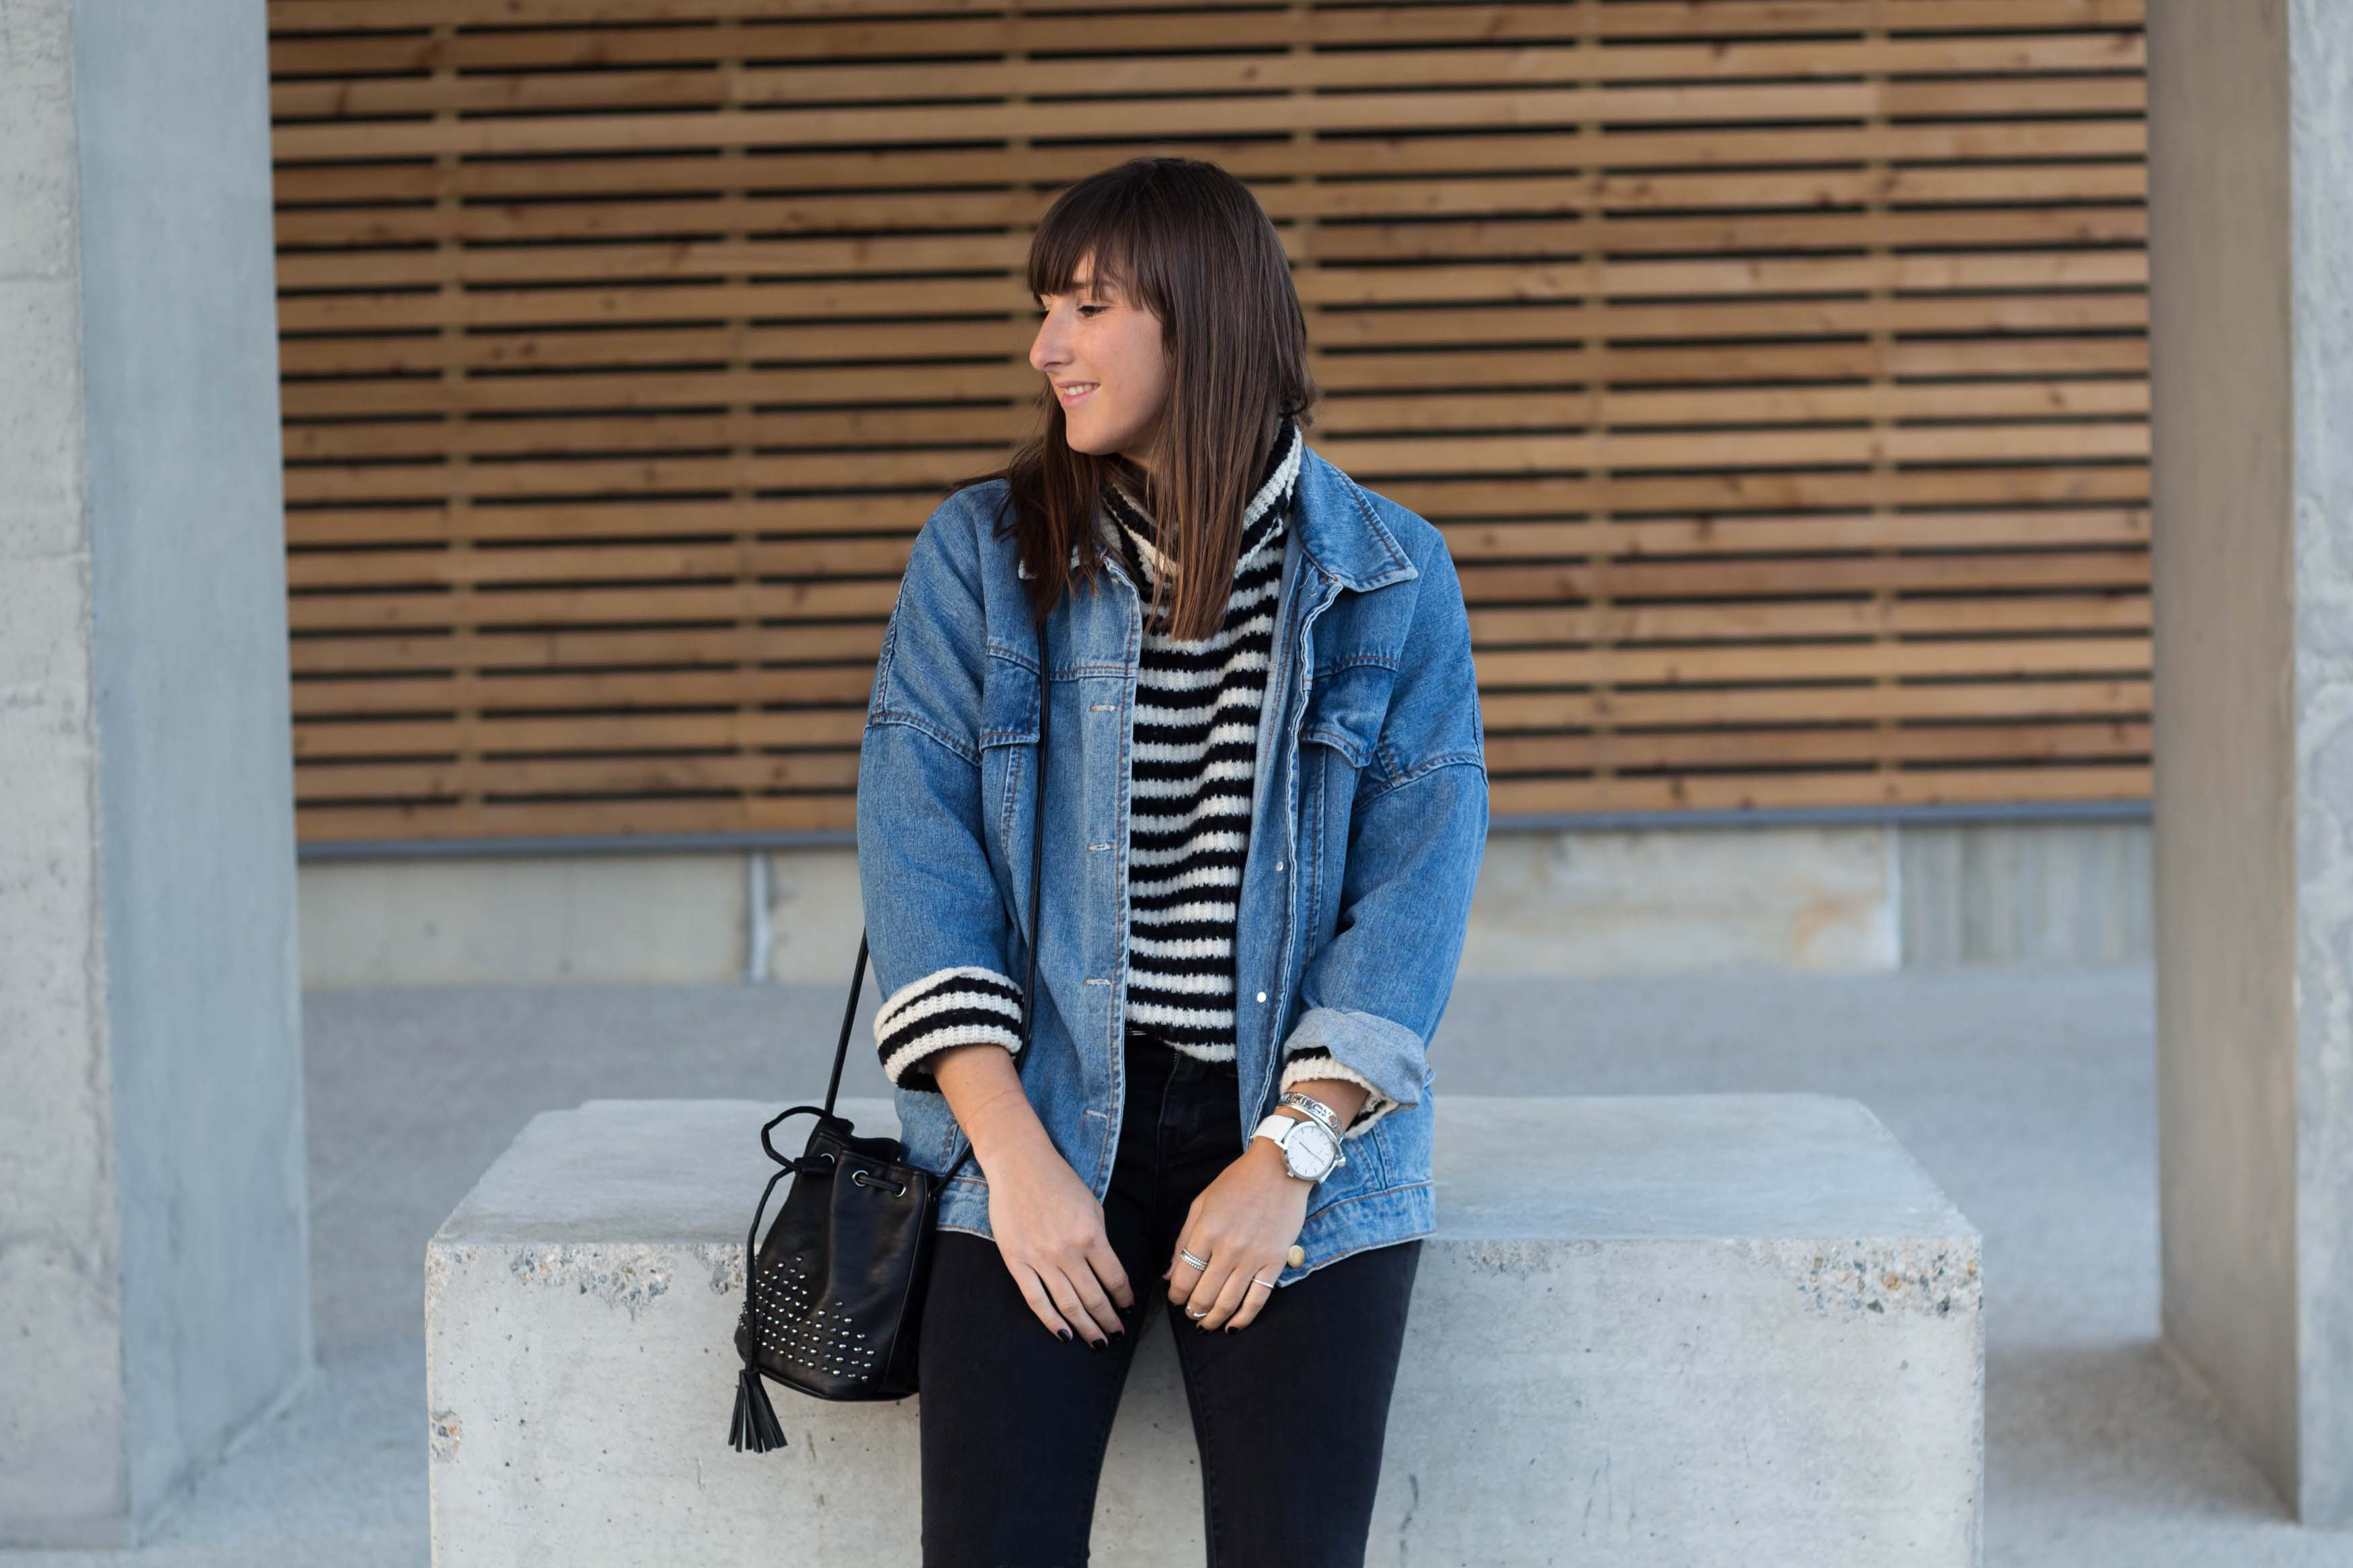 blog-mode-jean-shein-linstantflo-18-sur-18